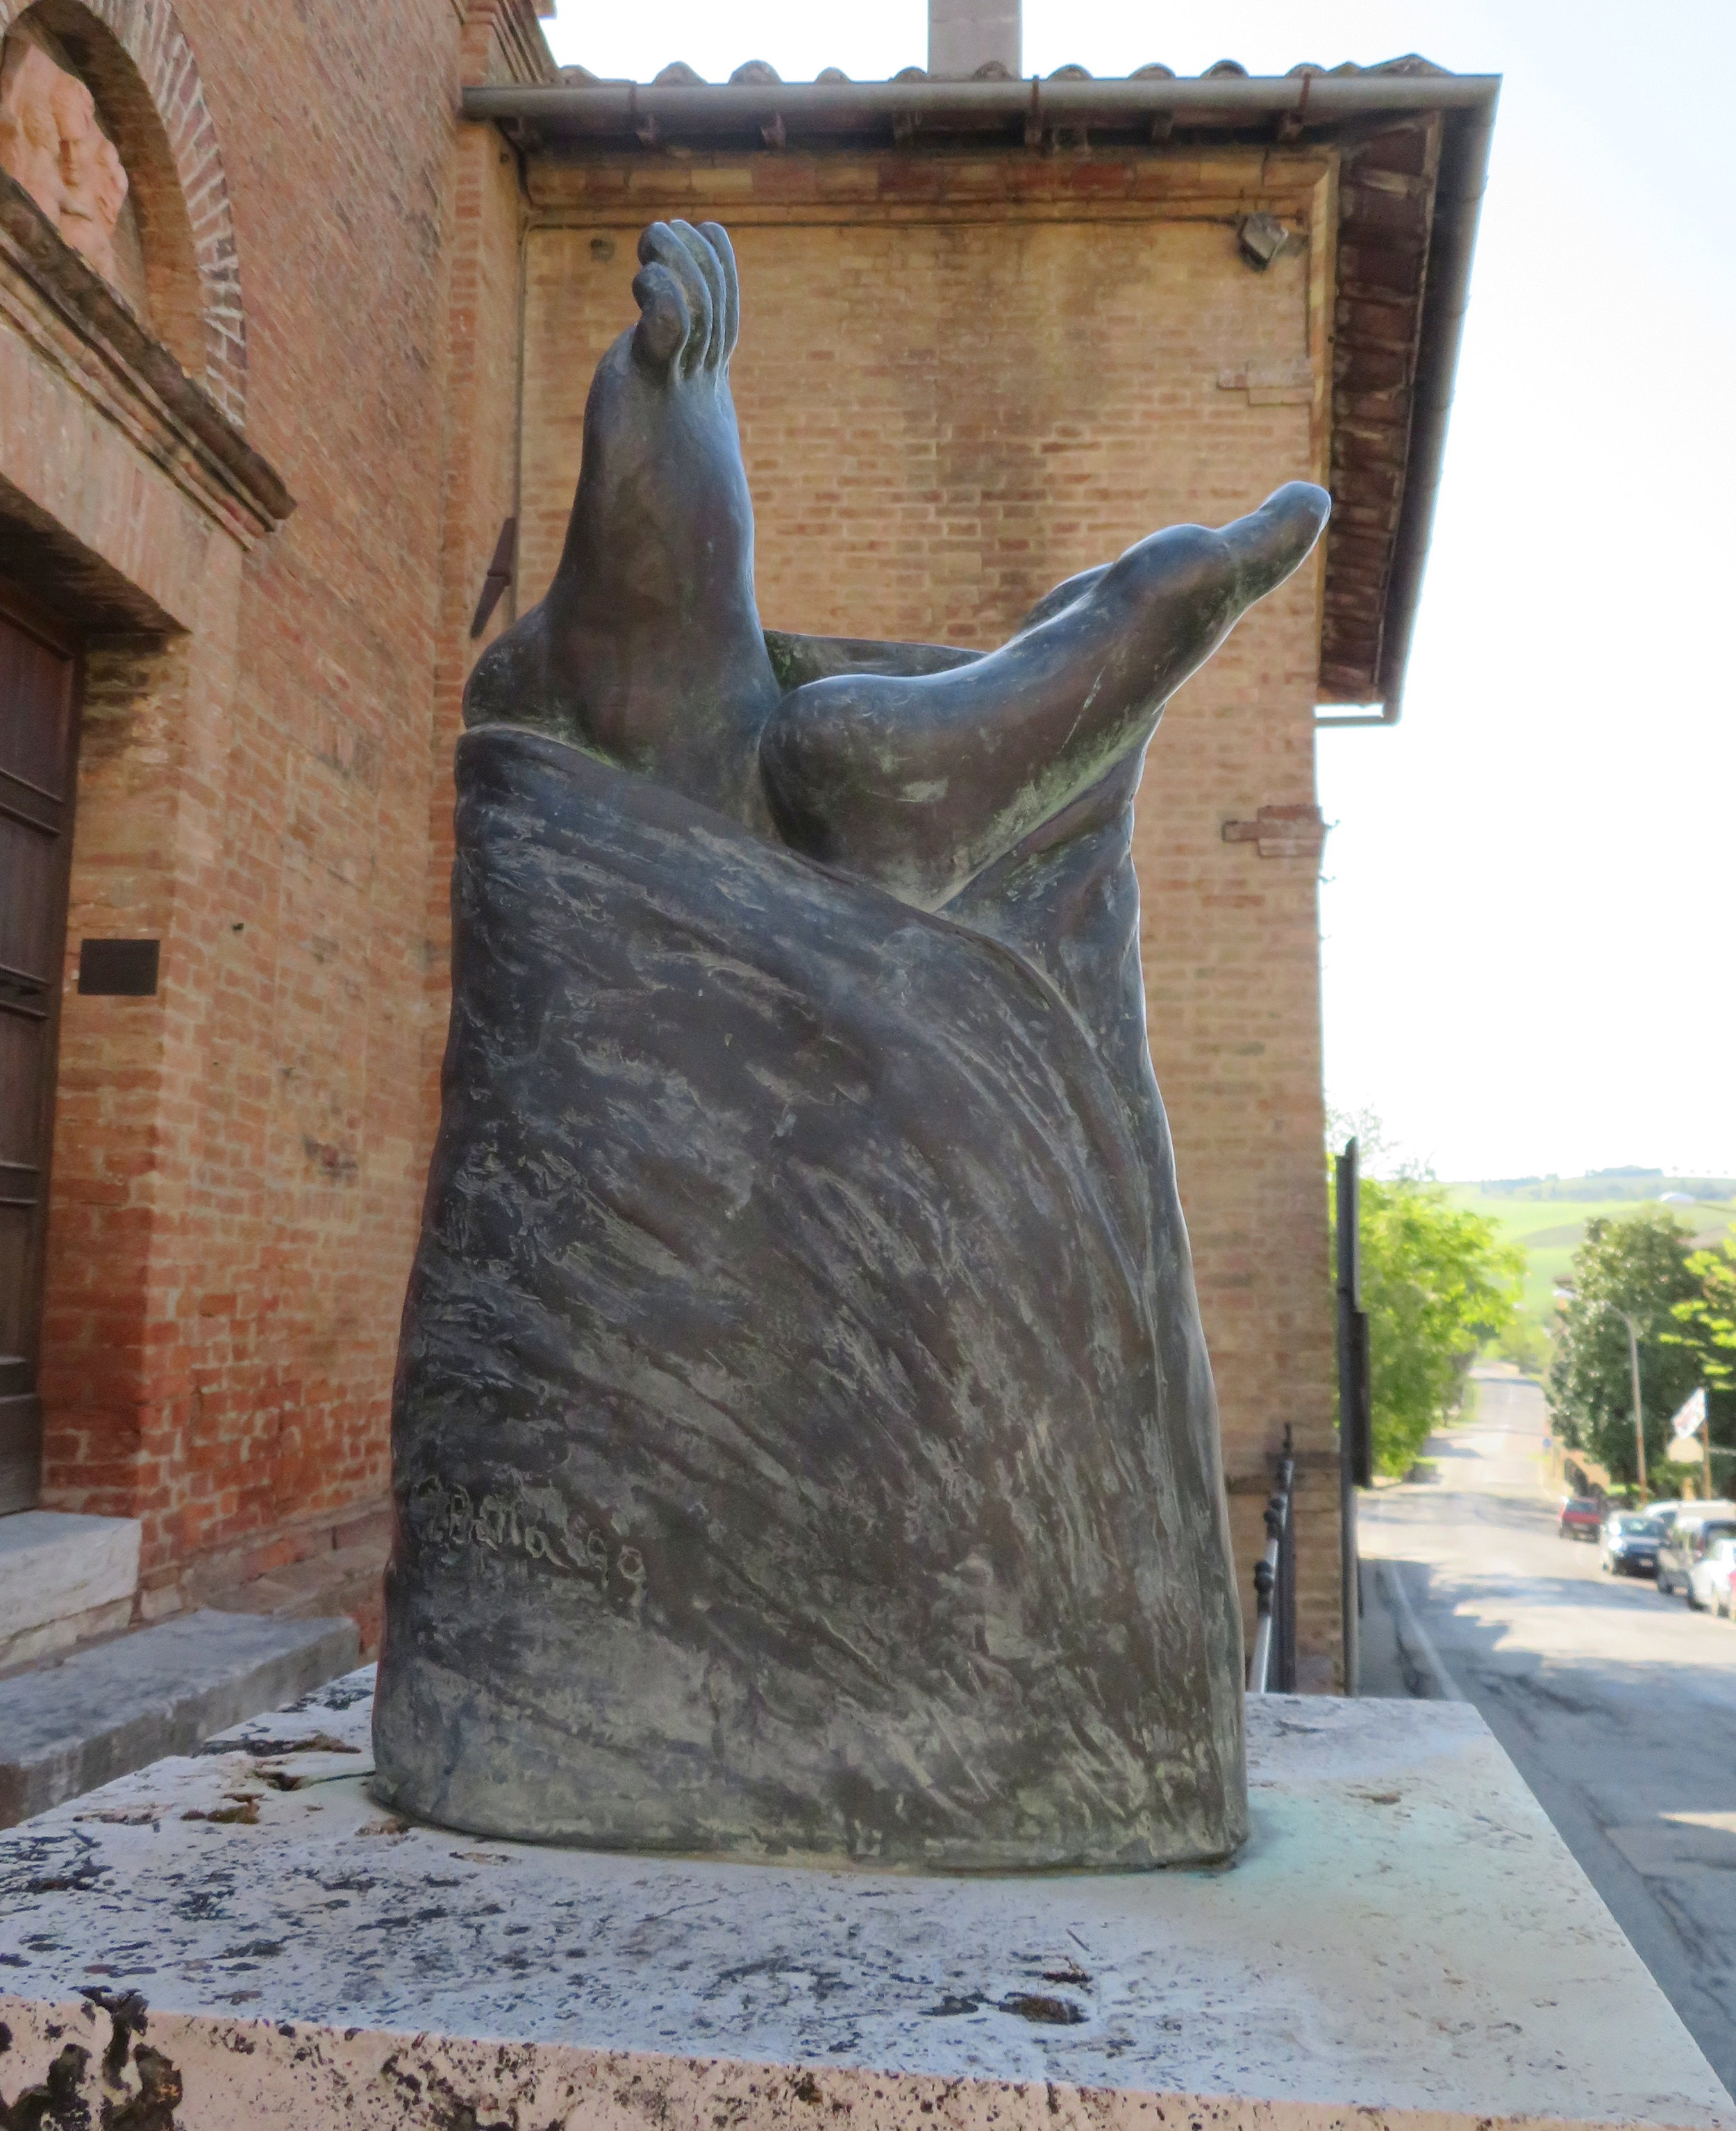 Monumento al pellgrino